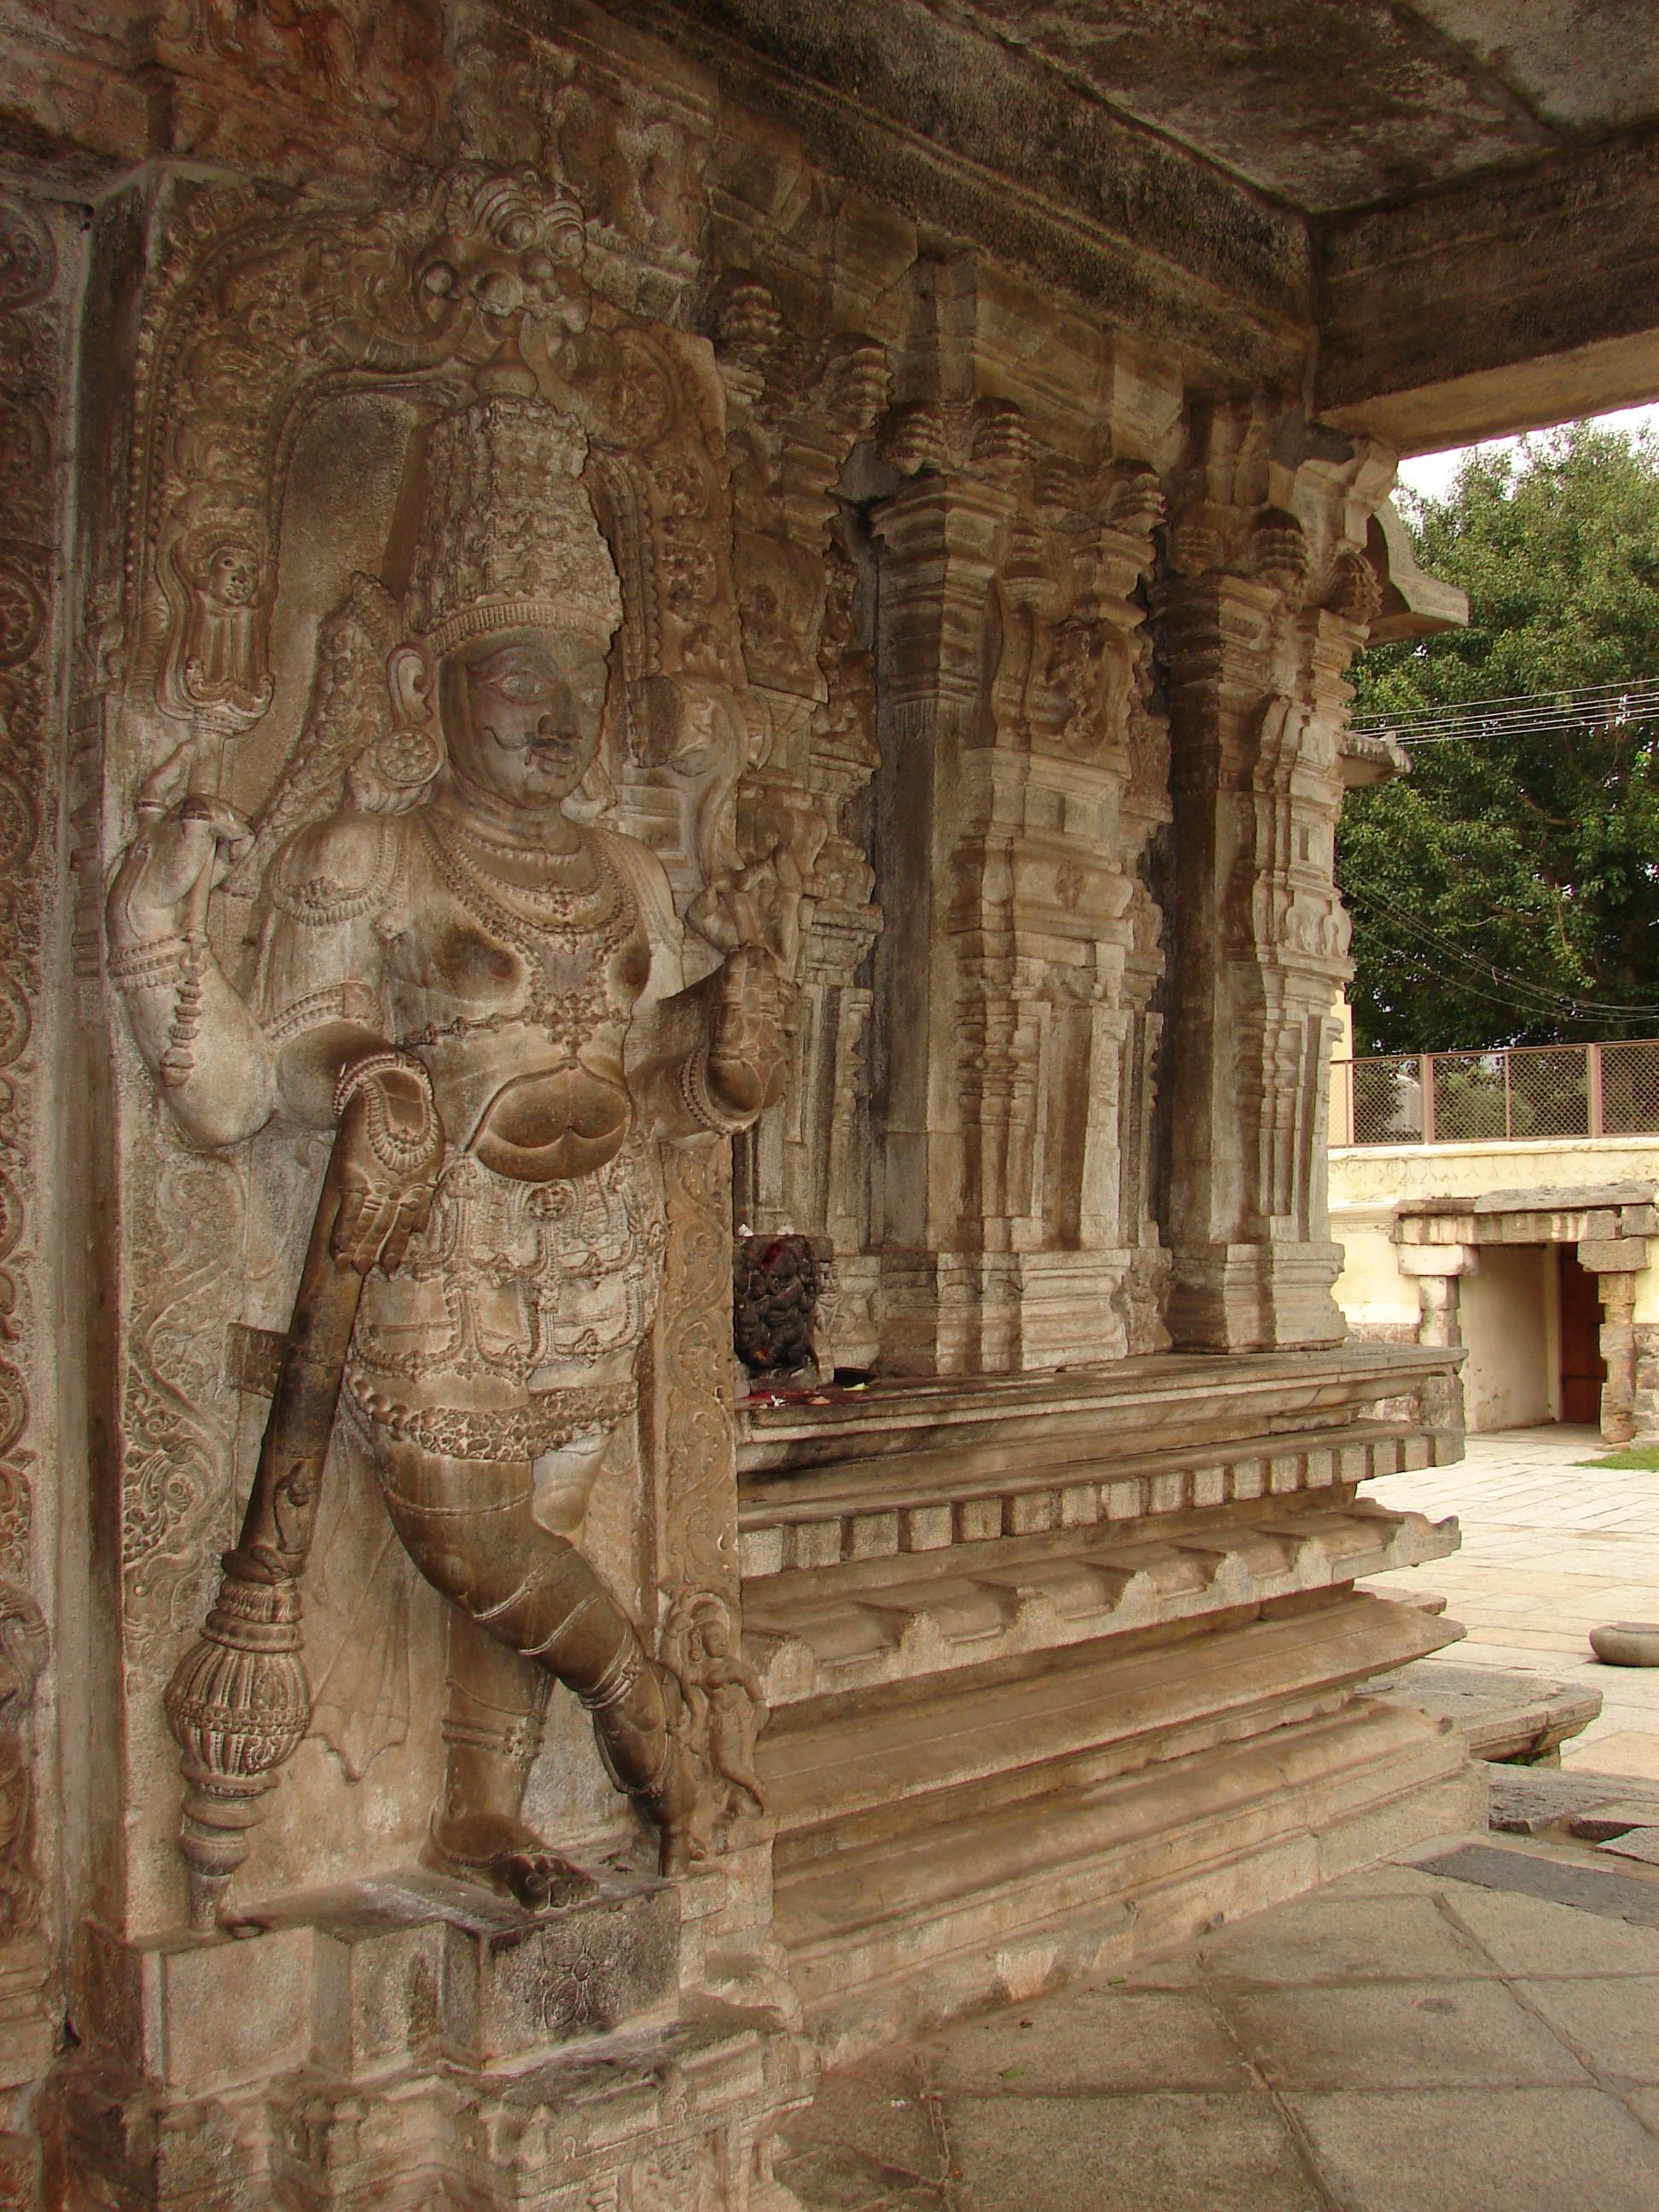 File:Dwarapalaka (door keeper to shrine) in Vaidyeshvara temple at Talakad.jpg & File:Dwarapalaka (door keeper to shrine) in Vaidyeshvara temple at ... Pezcame.Com